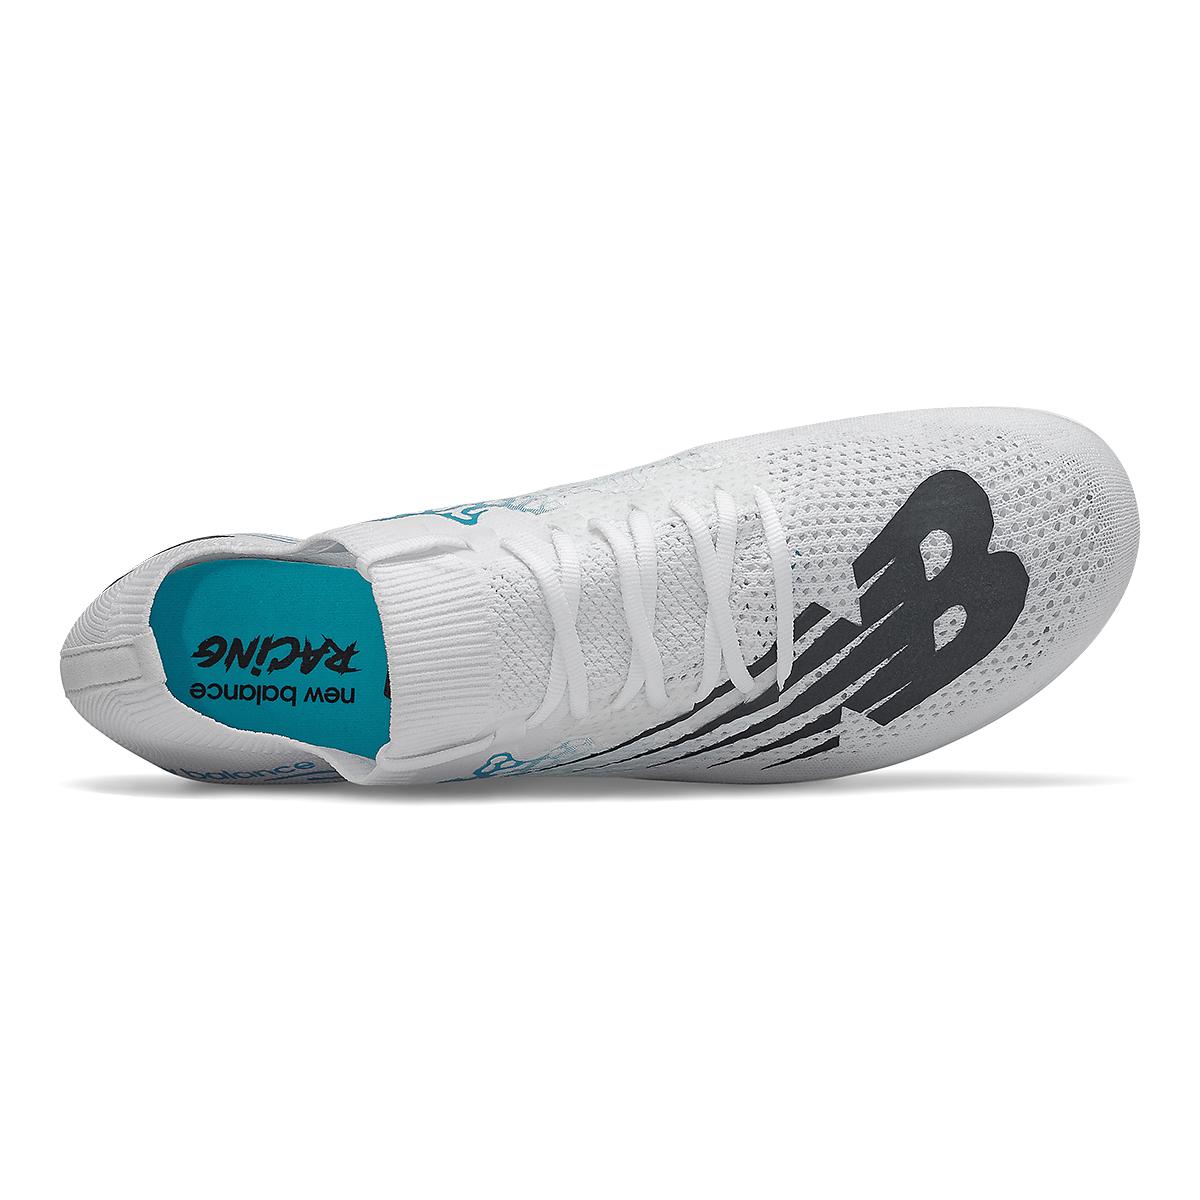 Men's New Balance LD5Kv8 Track Spikes - Color: White/Virtual Sky - Size: 8 - Width: Regular, White/Virtual Sky, large, image 2